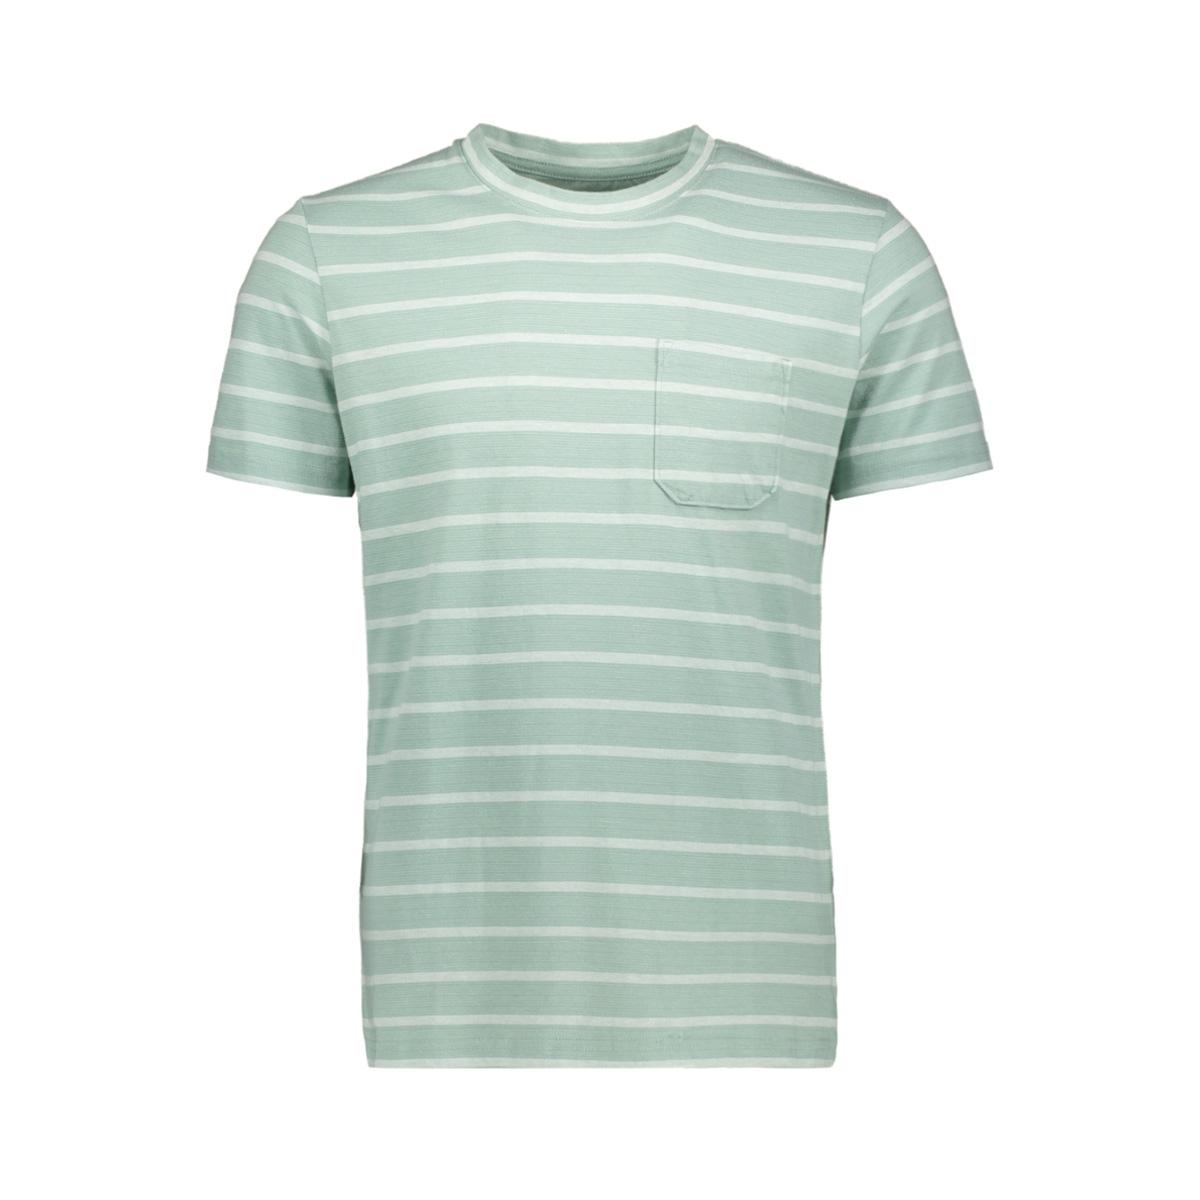 jcoklark tee ss crew neck 12152495 jack & jones t-shirt blue surf/slim